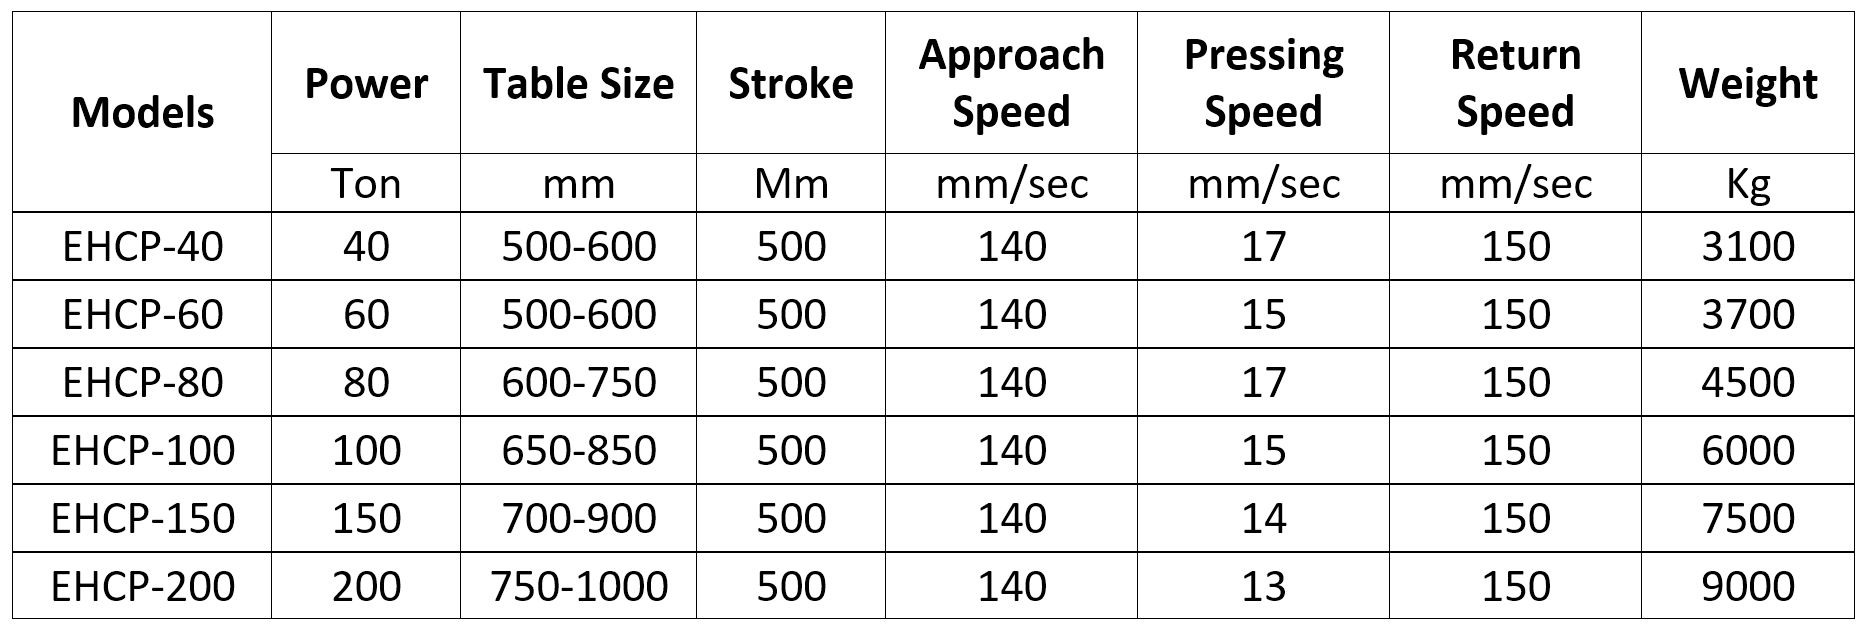 C Type Hydraulic Press models